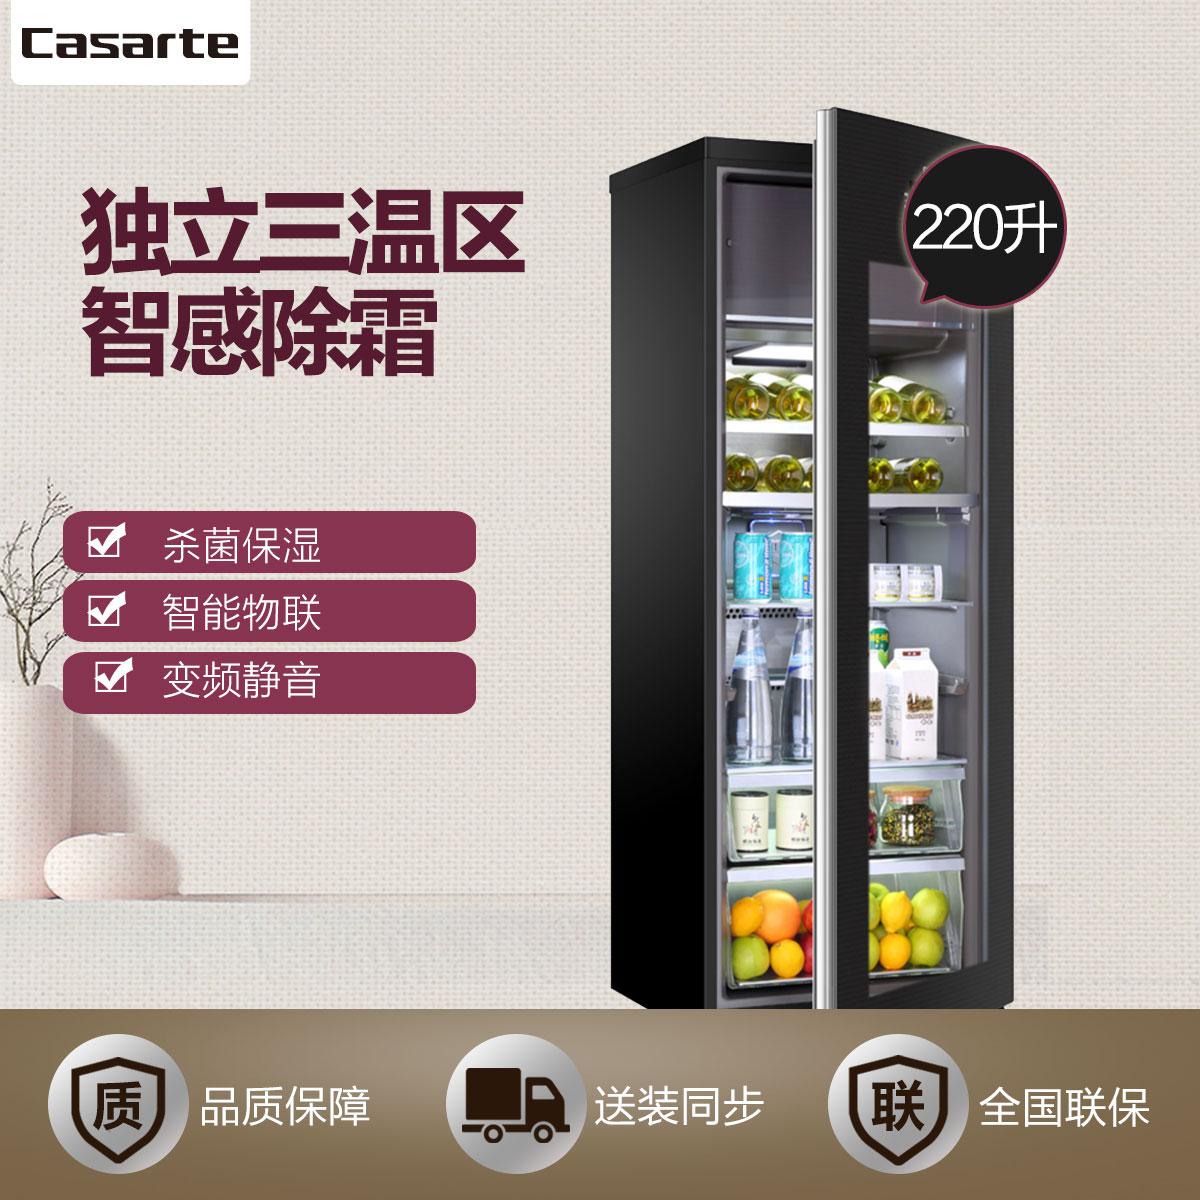 Casarte/卡萨帝 冰吧 LC-220JE